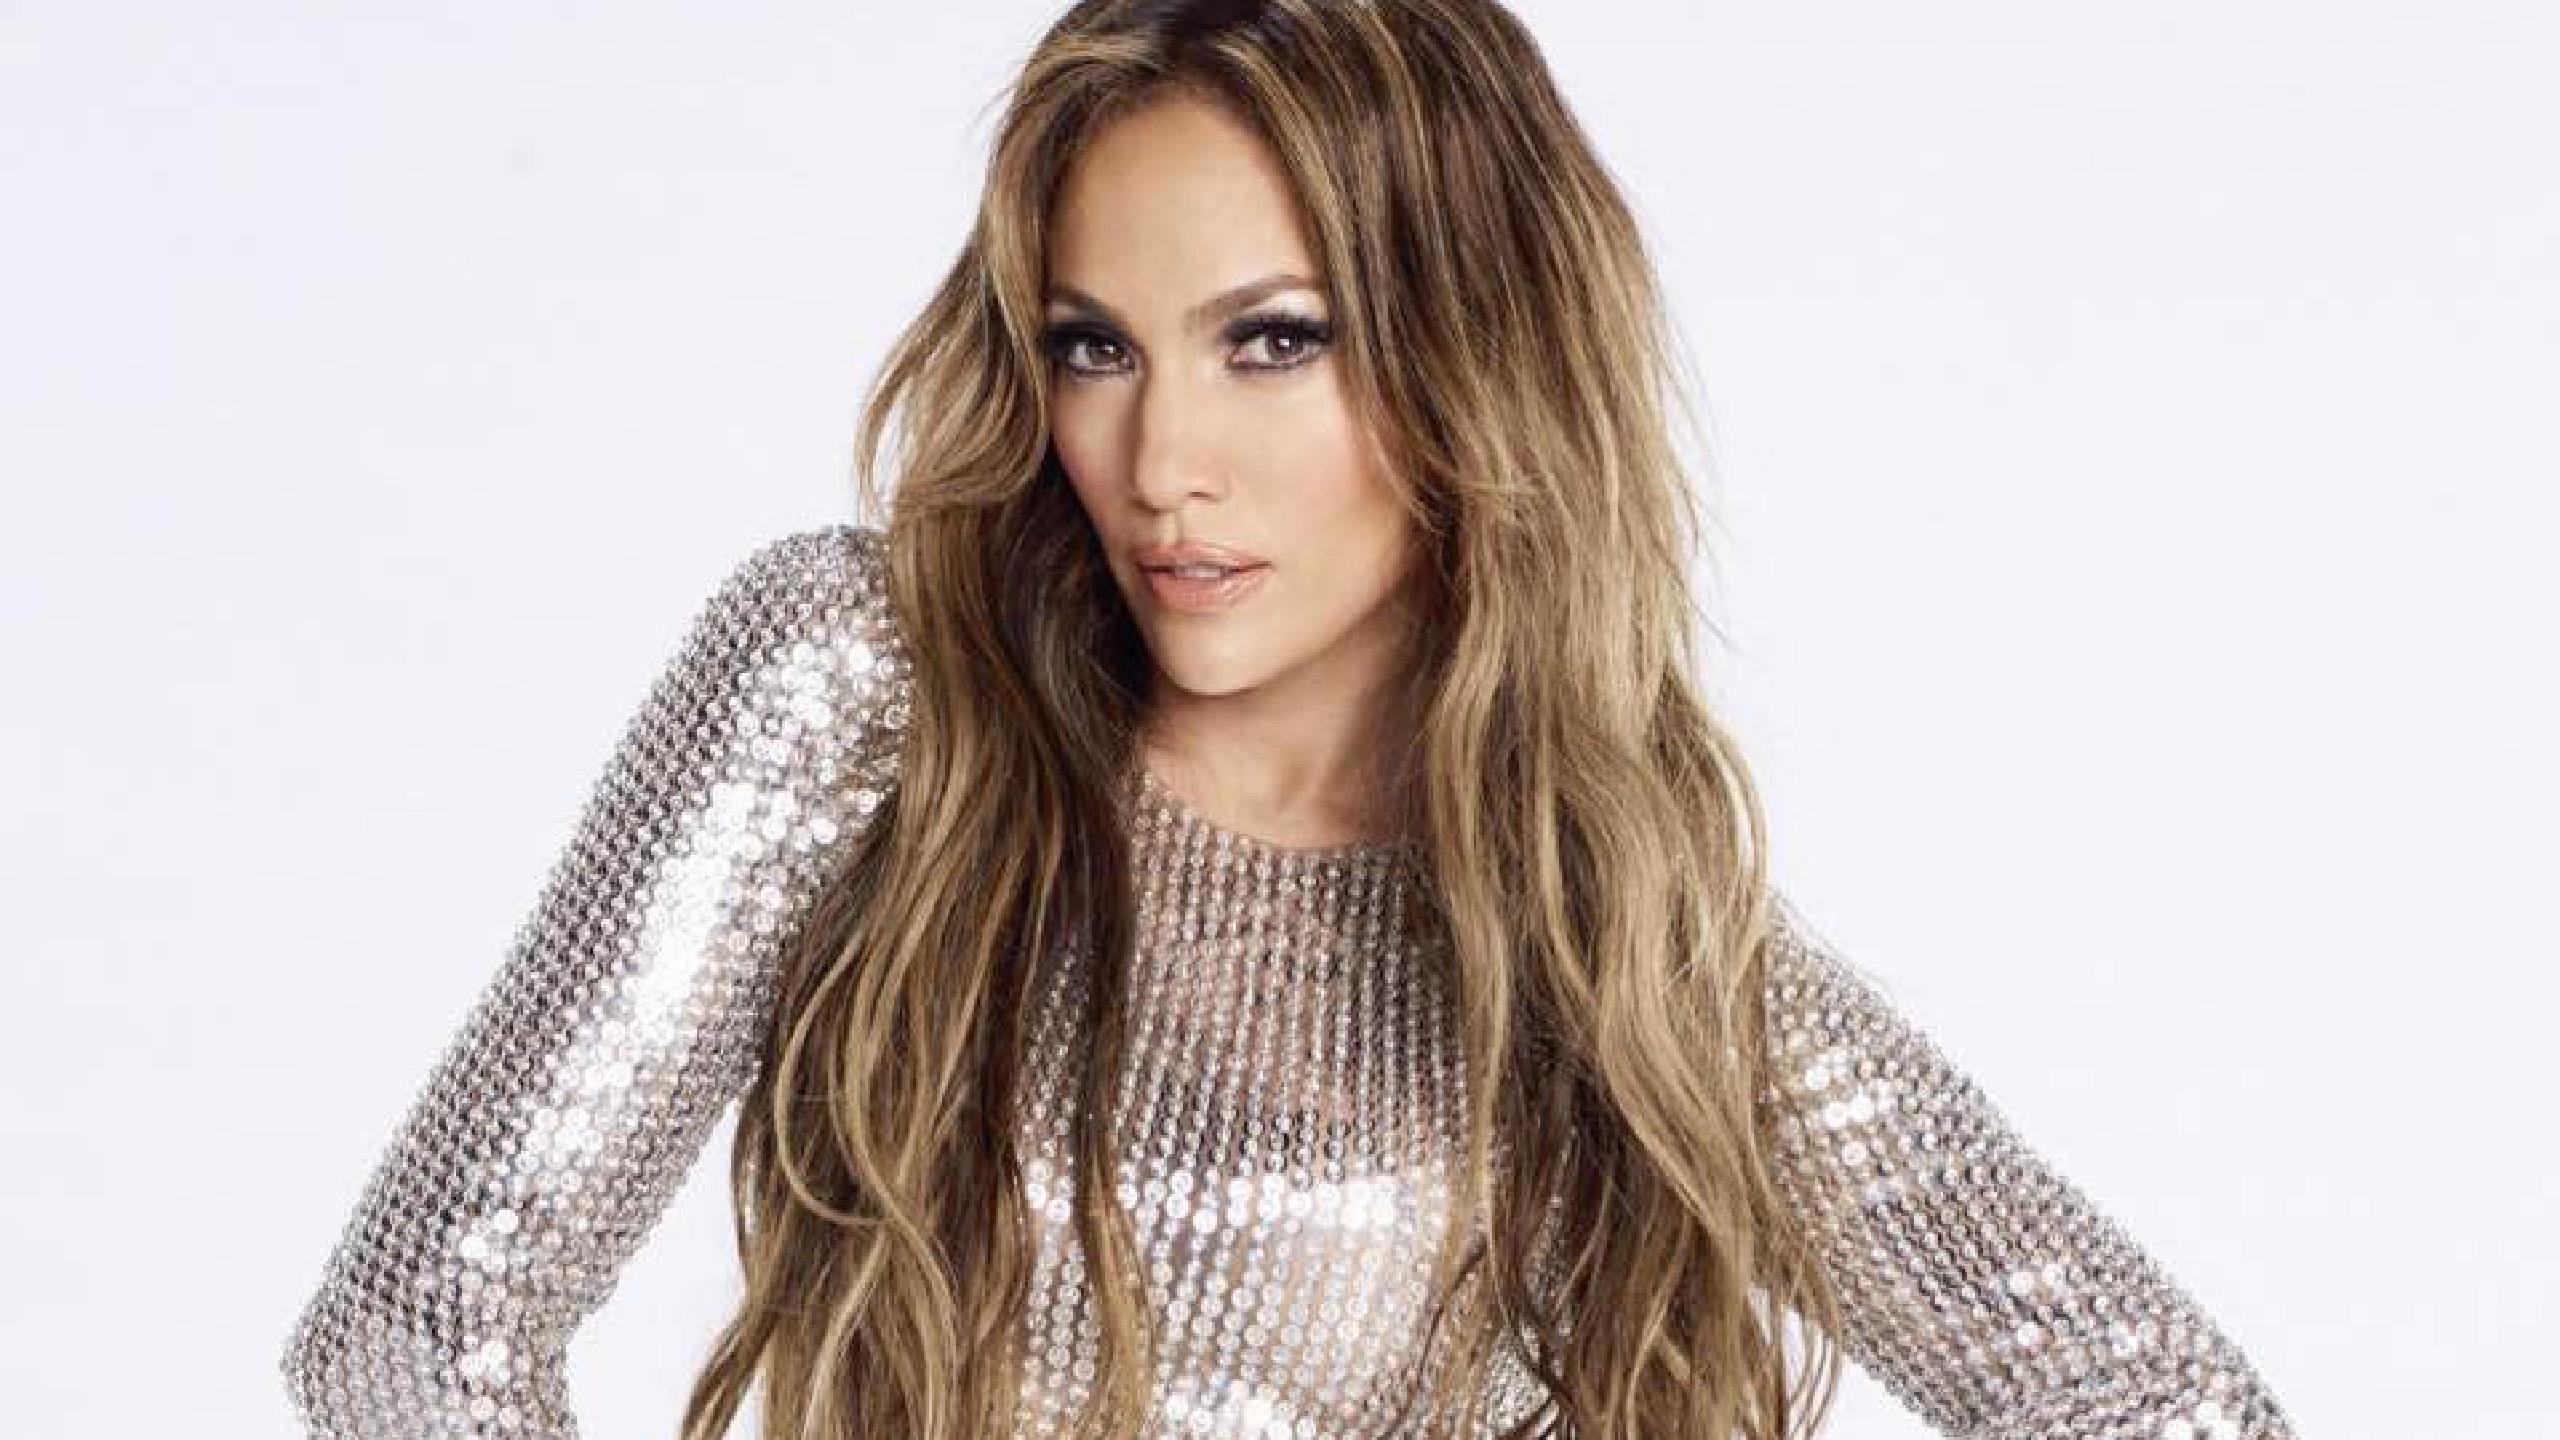 Jennifer Lopez Wallpaper 2018 81 Images